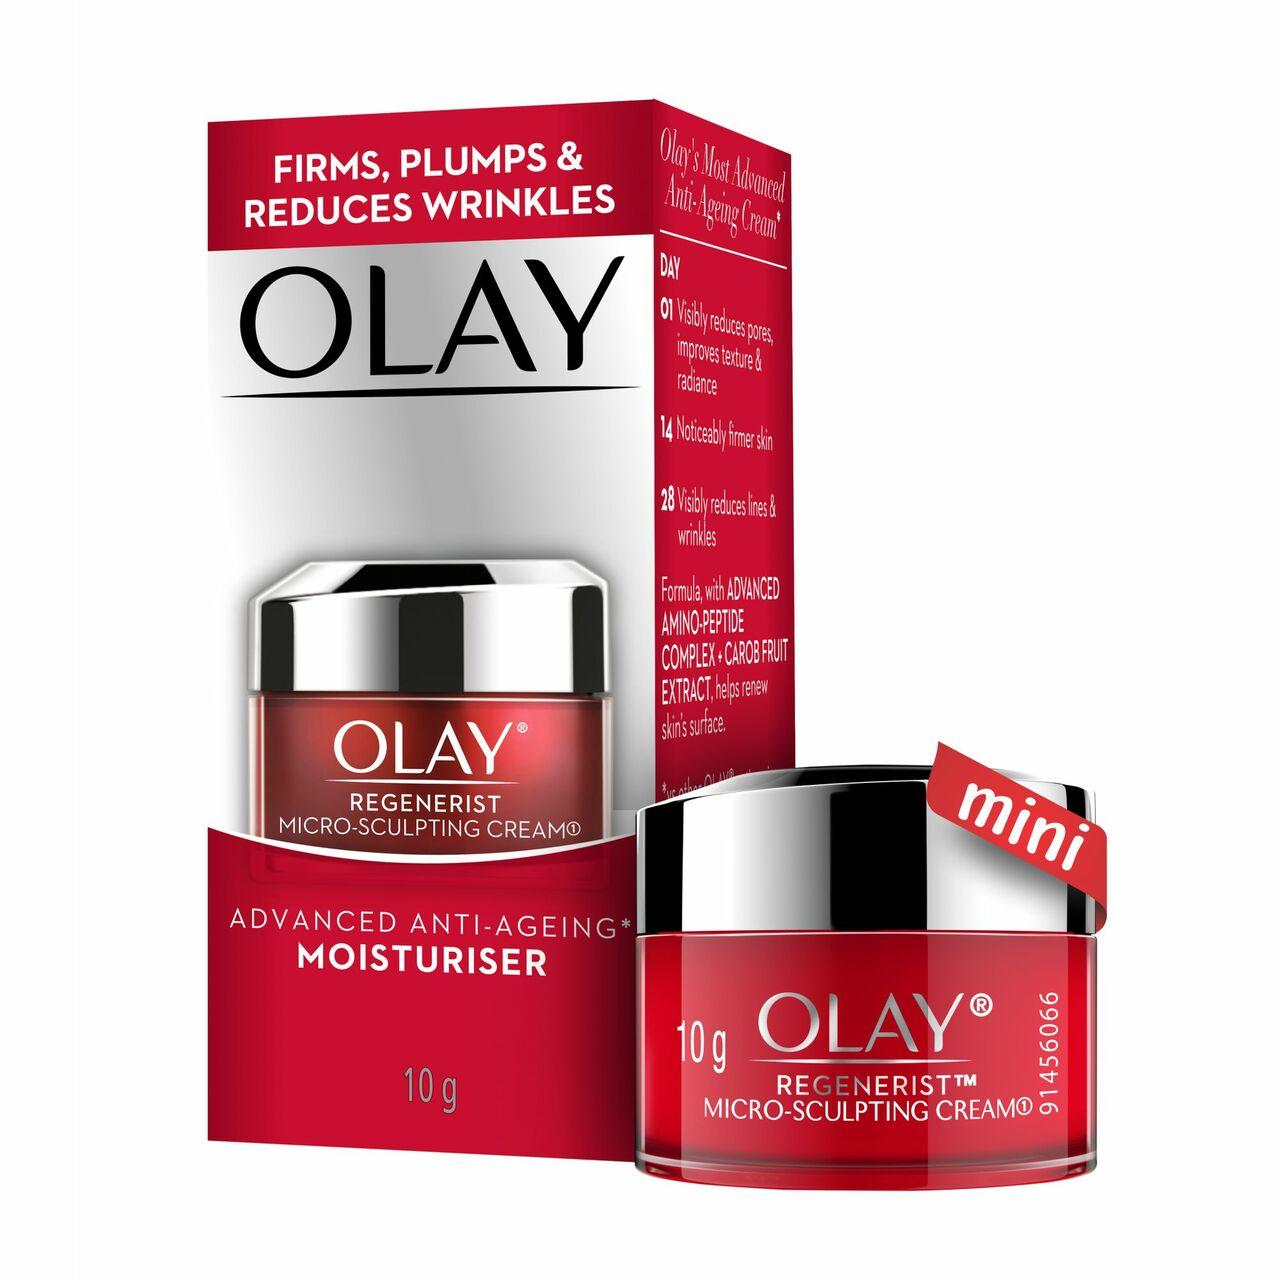 Olay Mini Cream : Regenerist Microsculpting